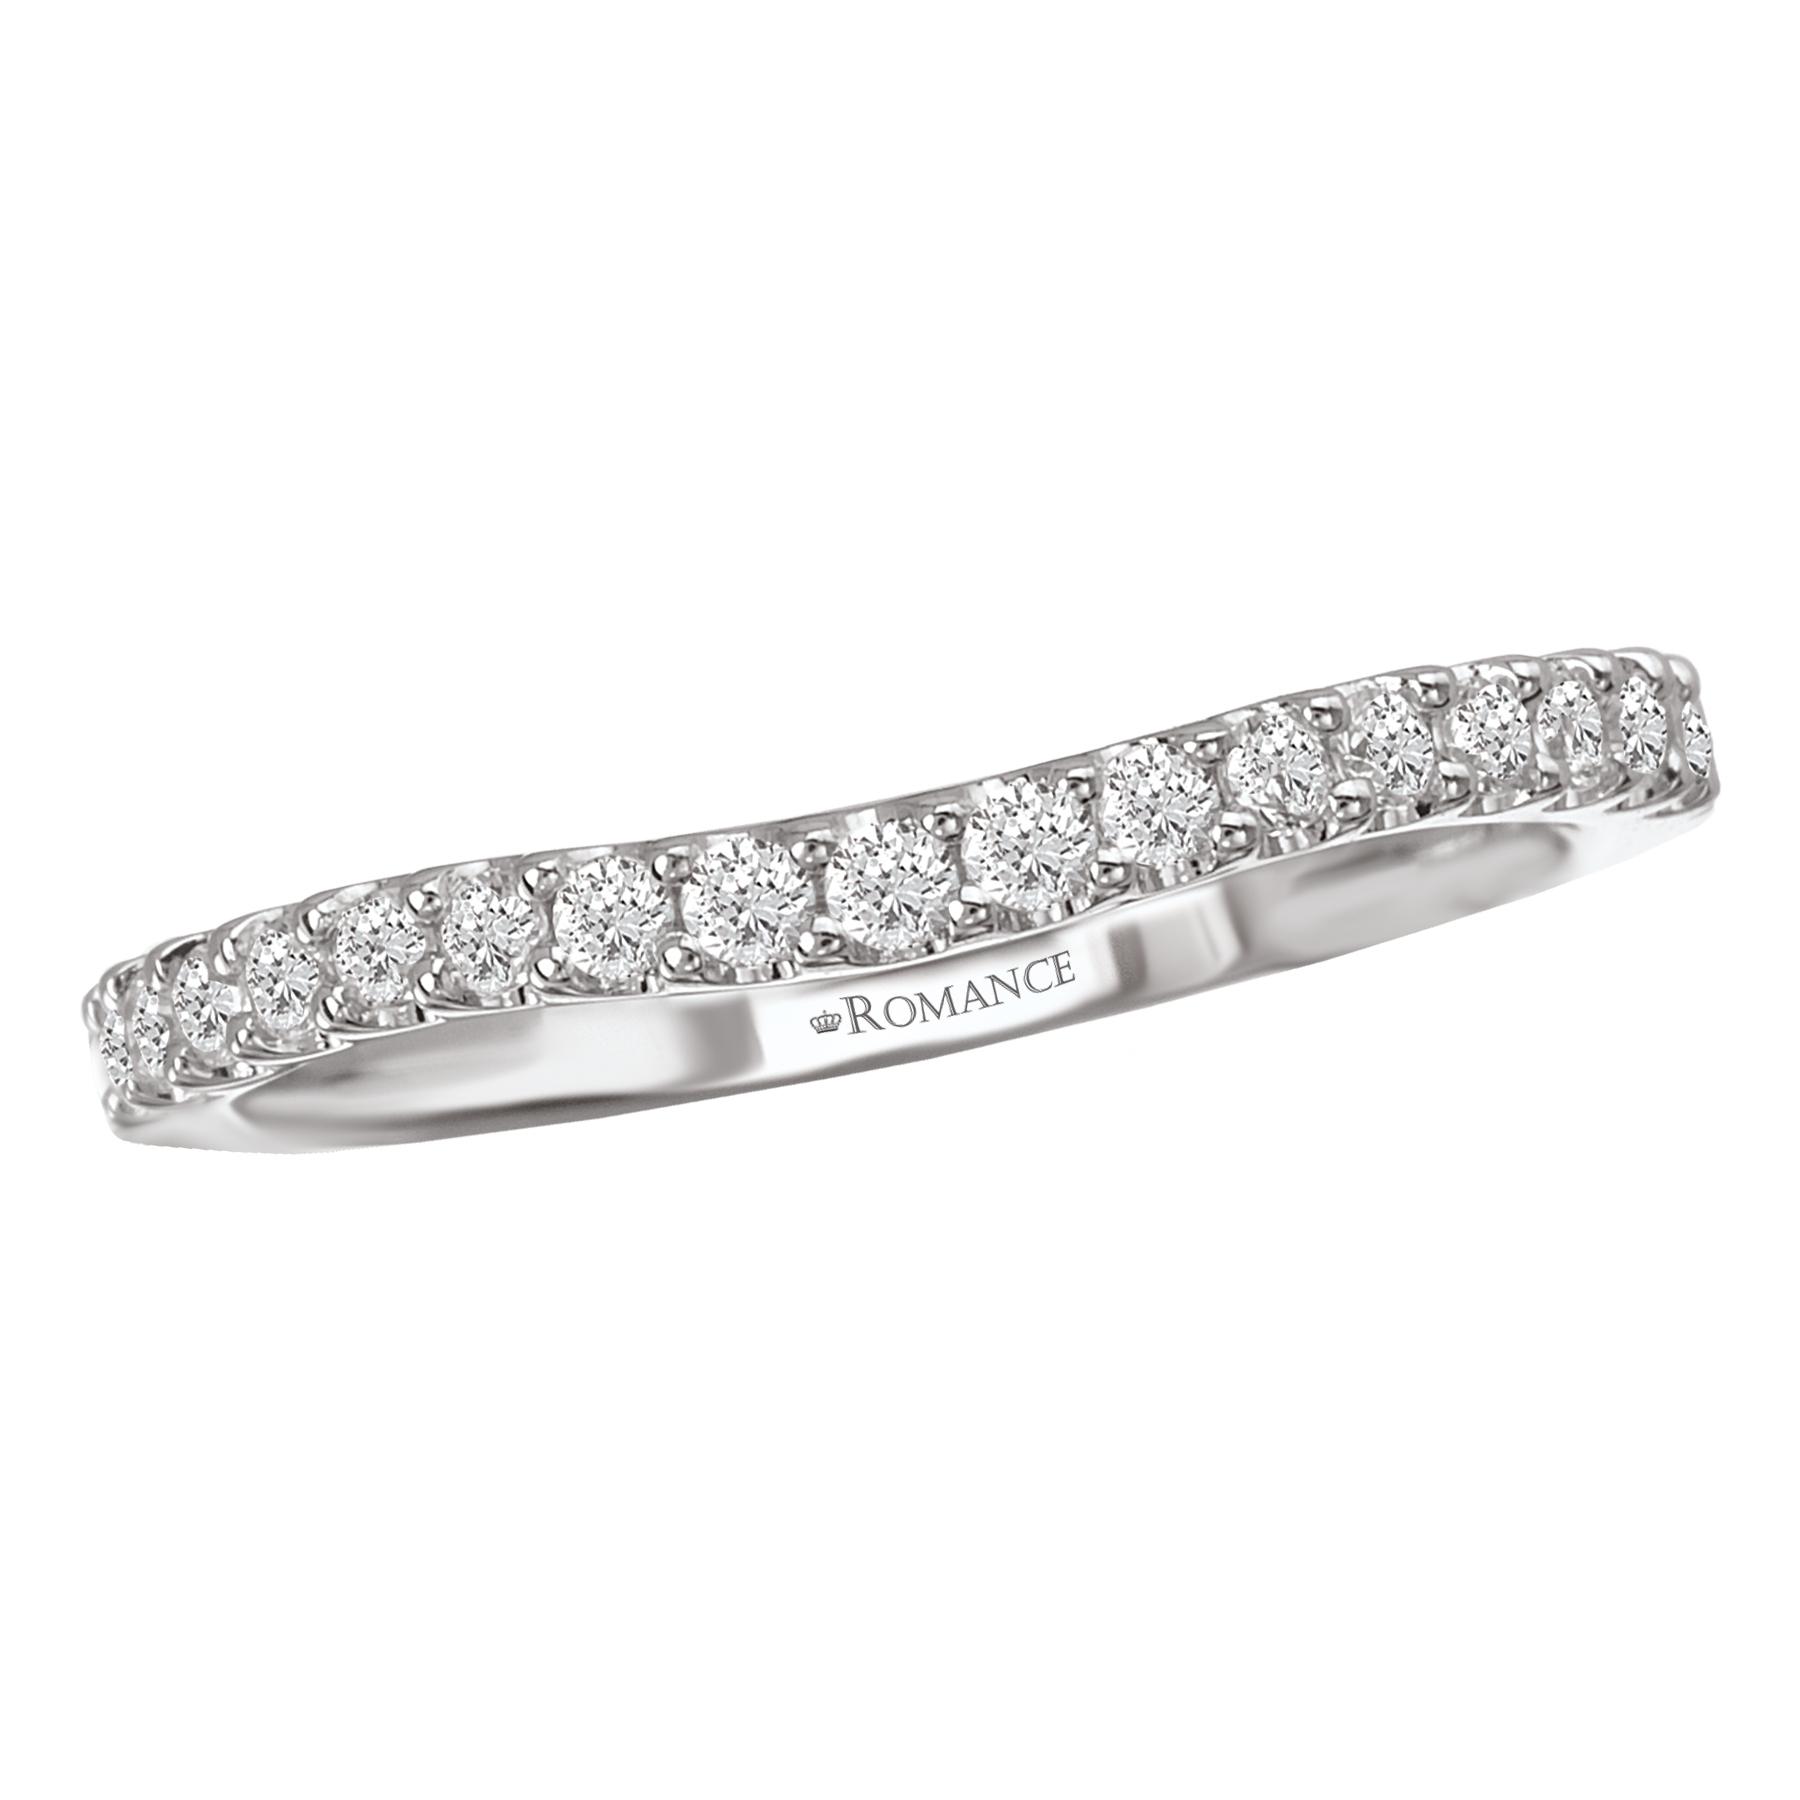 Romance Wedding Bands 117486-W product image